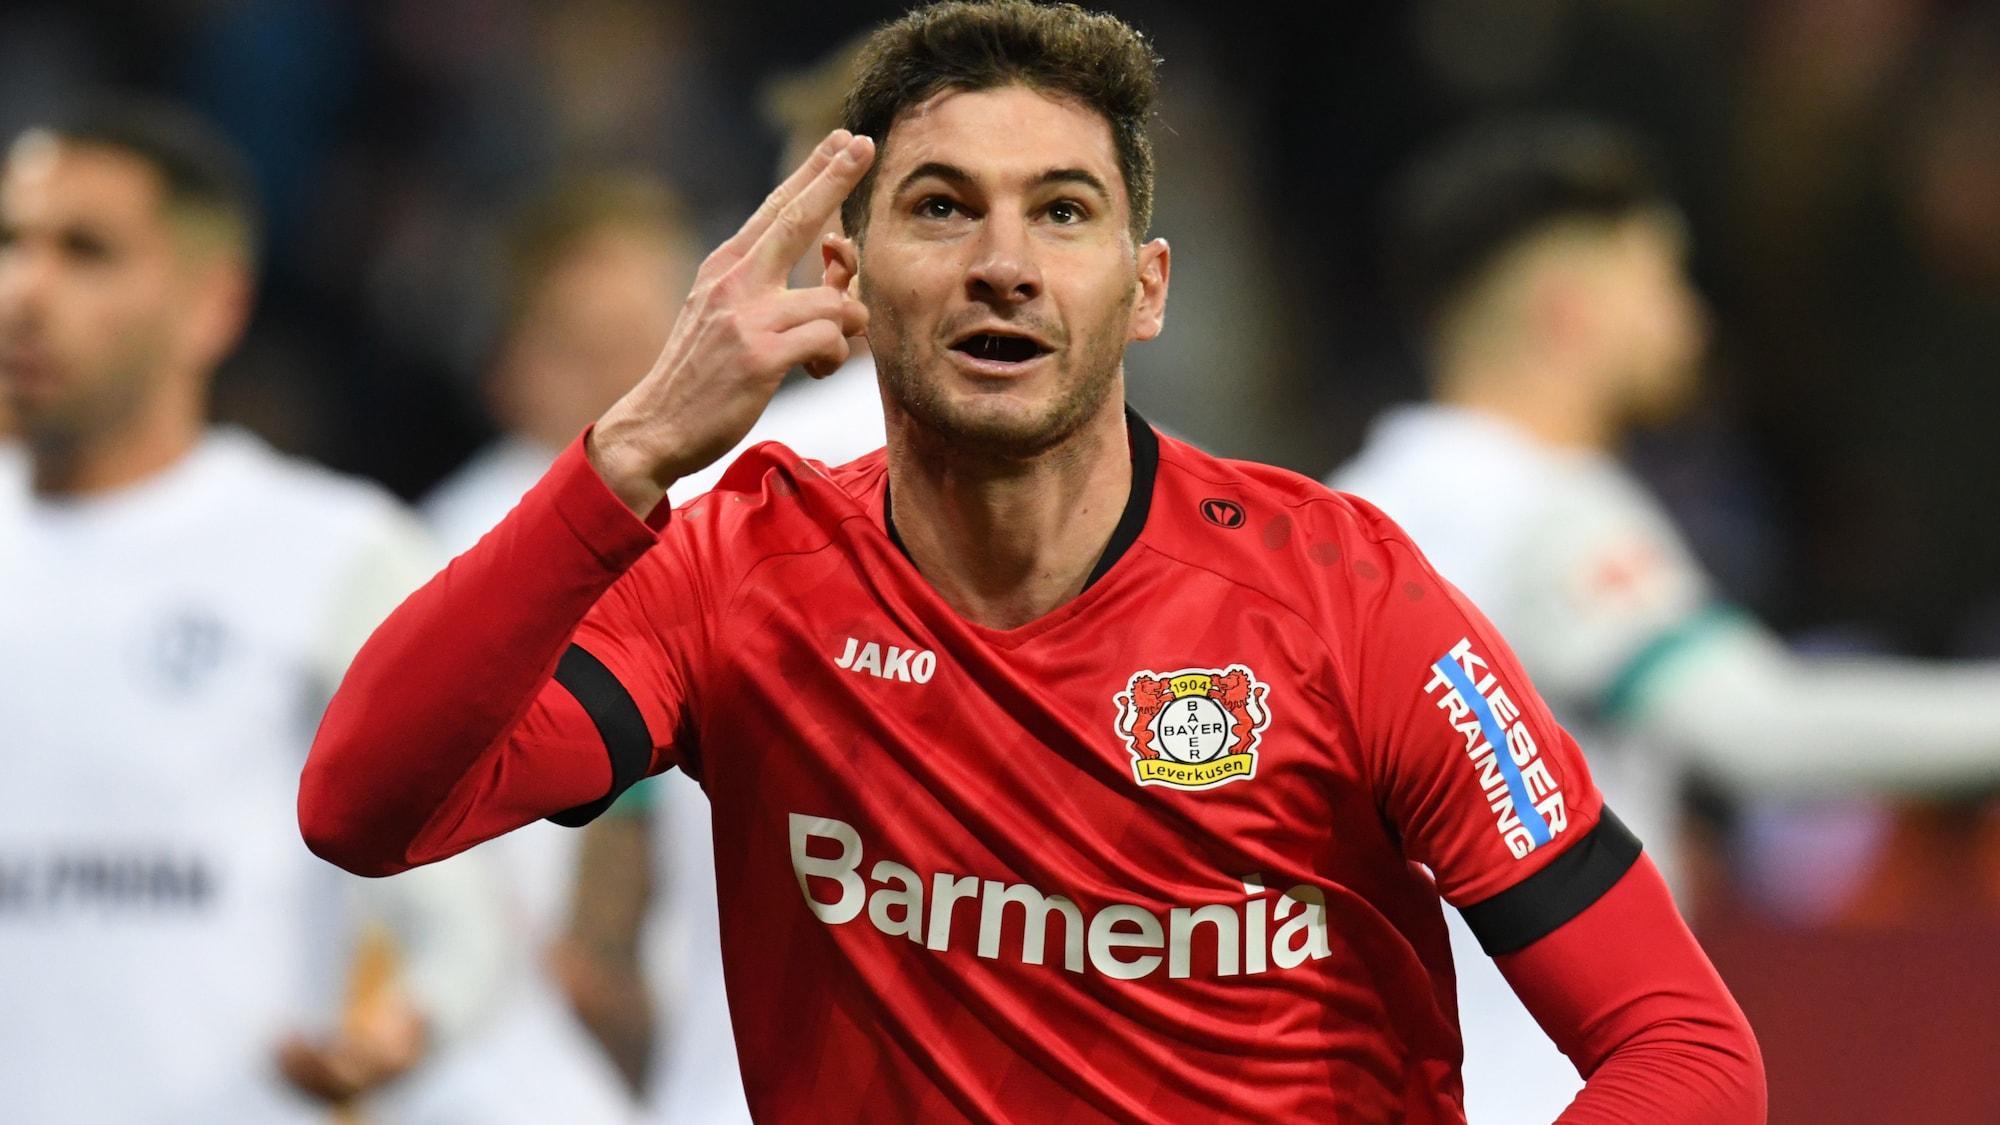 Sieg gegen Schalke: Leverkusen kombiniert – Alario trifft doppelt